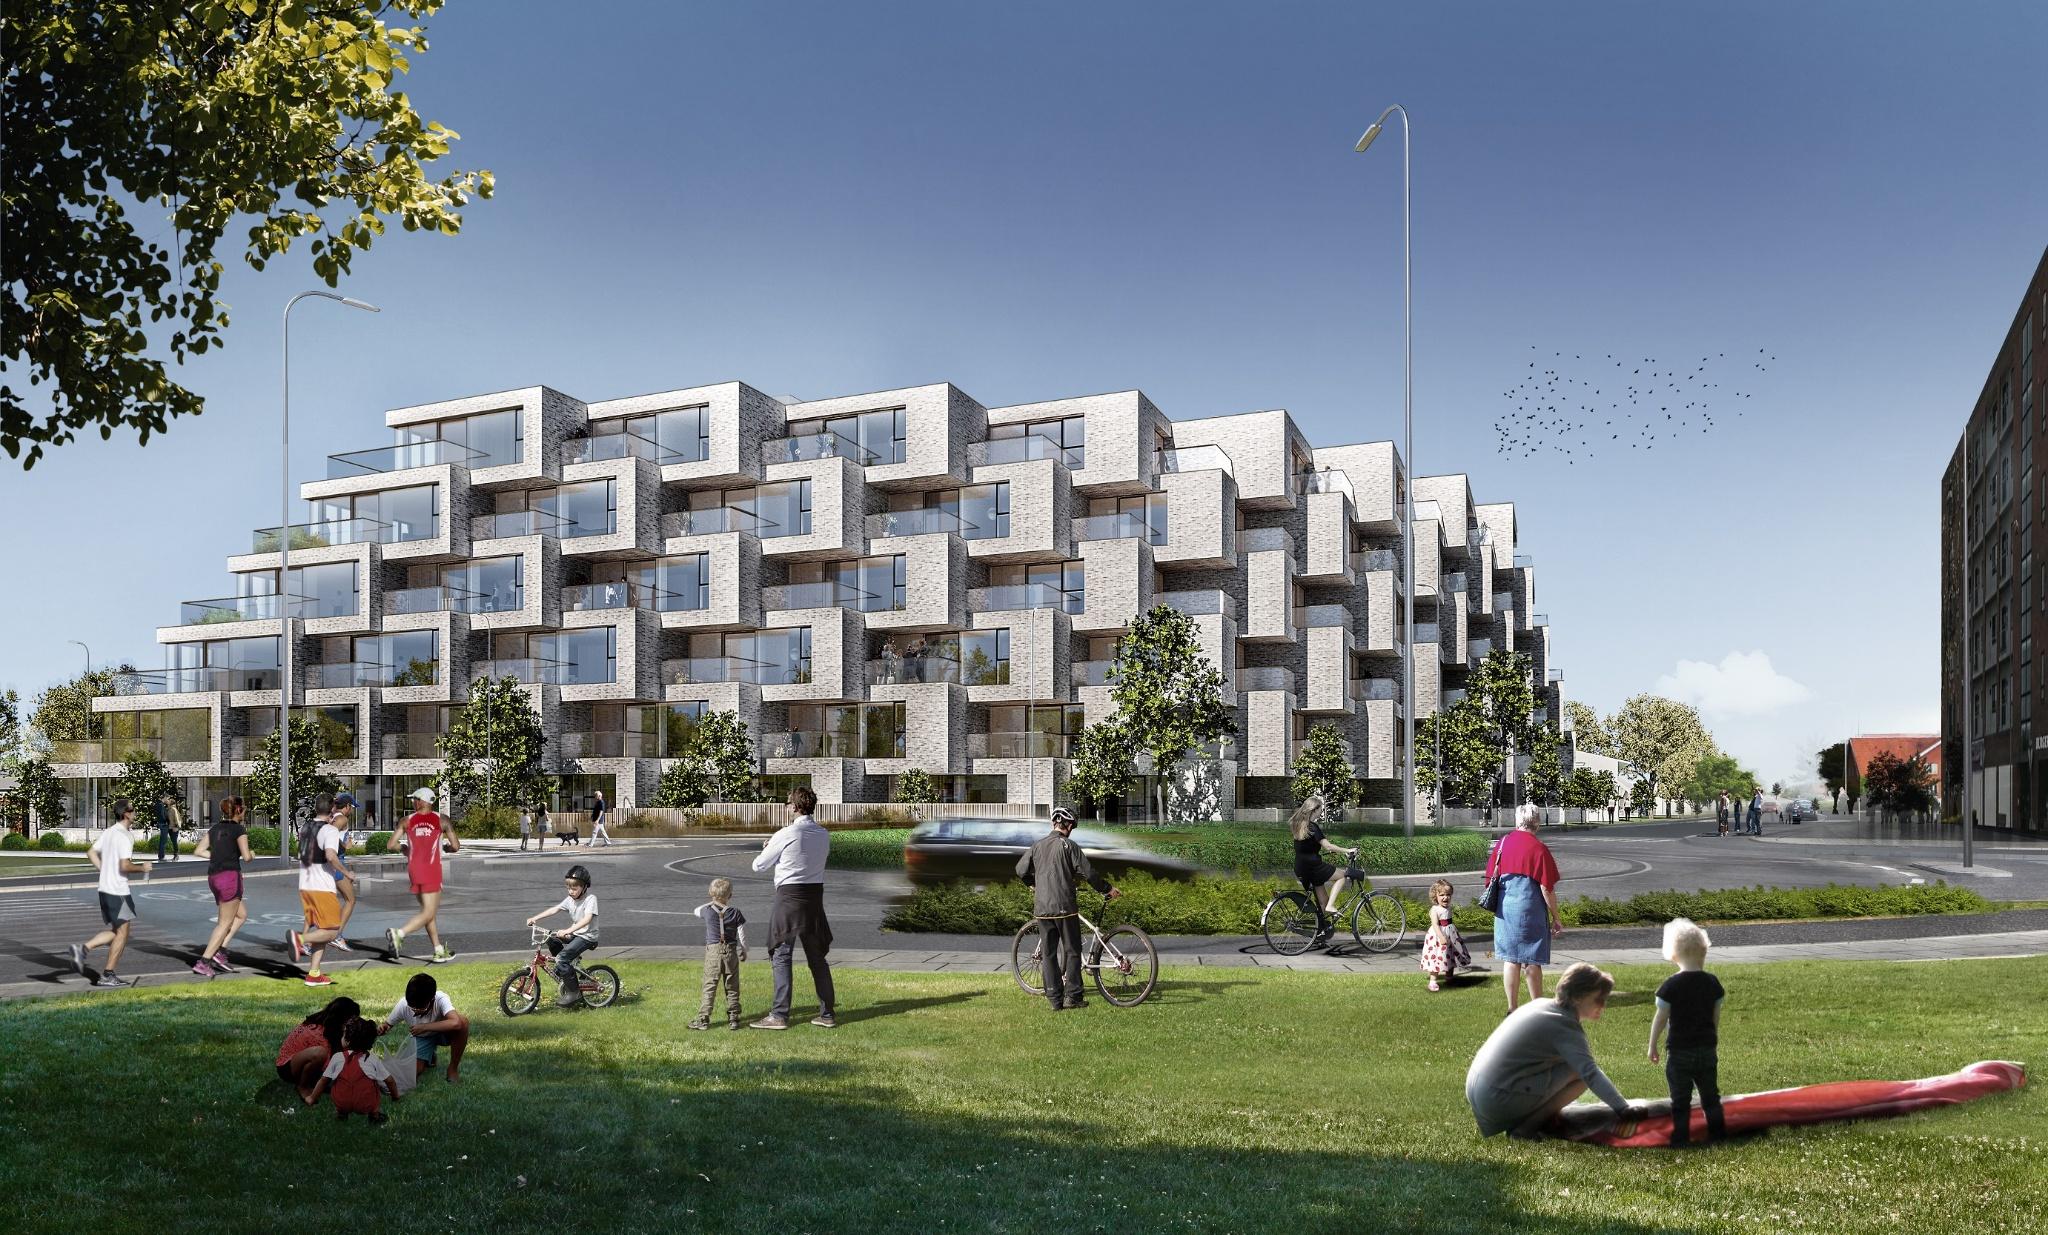 Spektakulært BIG-byggeri i Billund med betonelementer fra Contiga